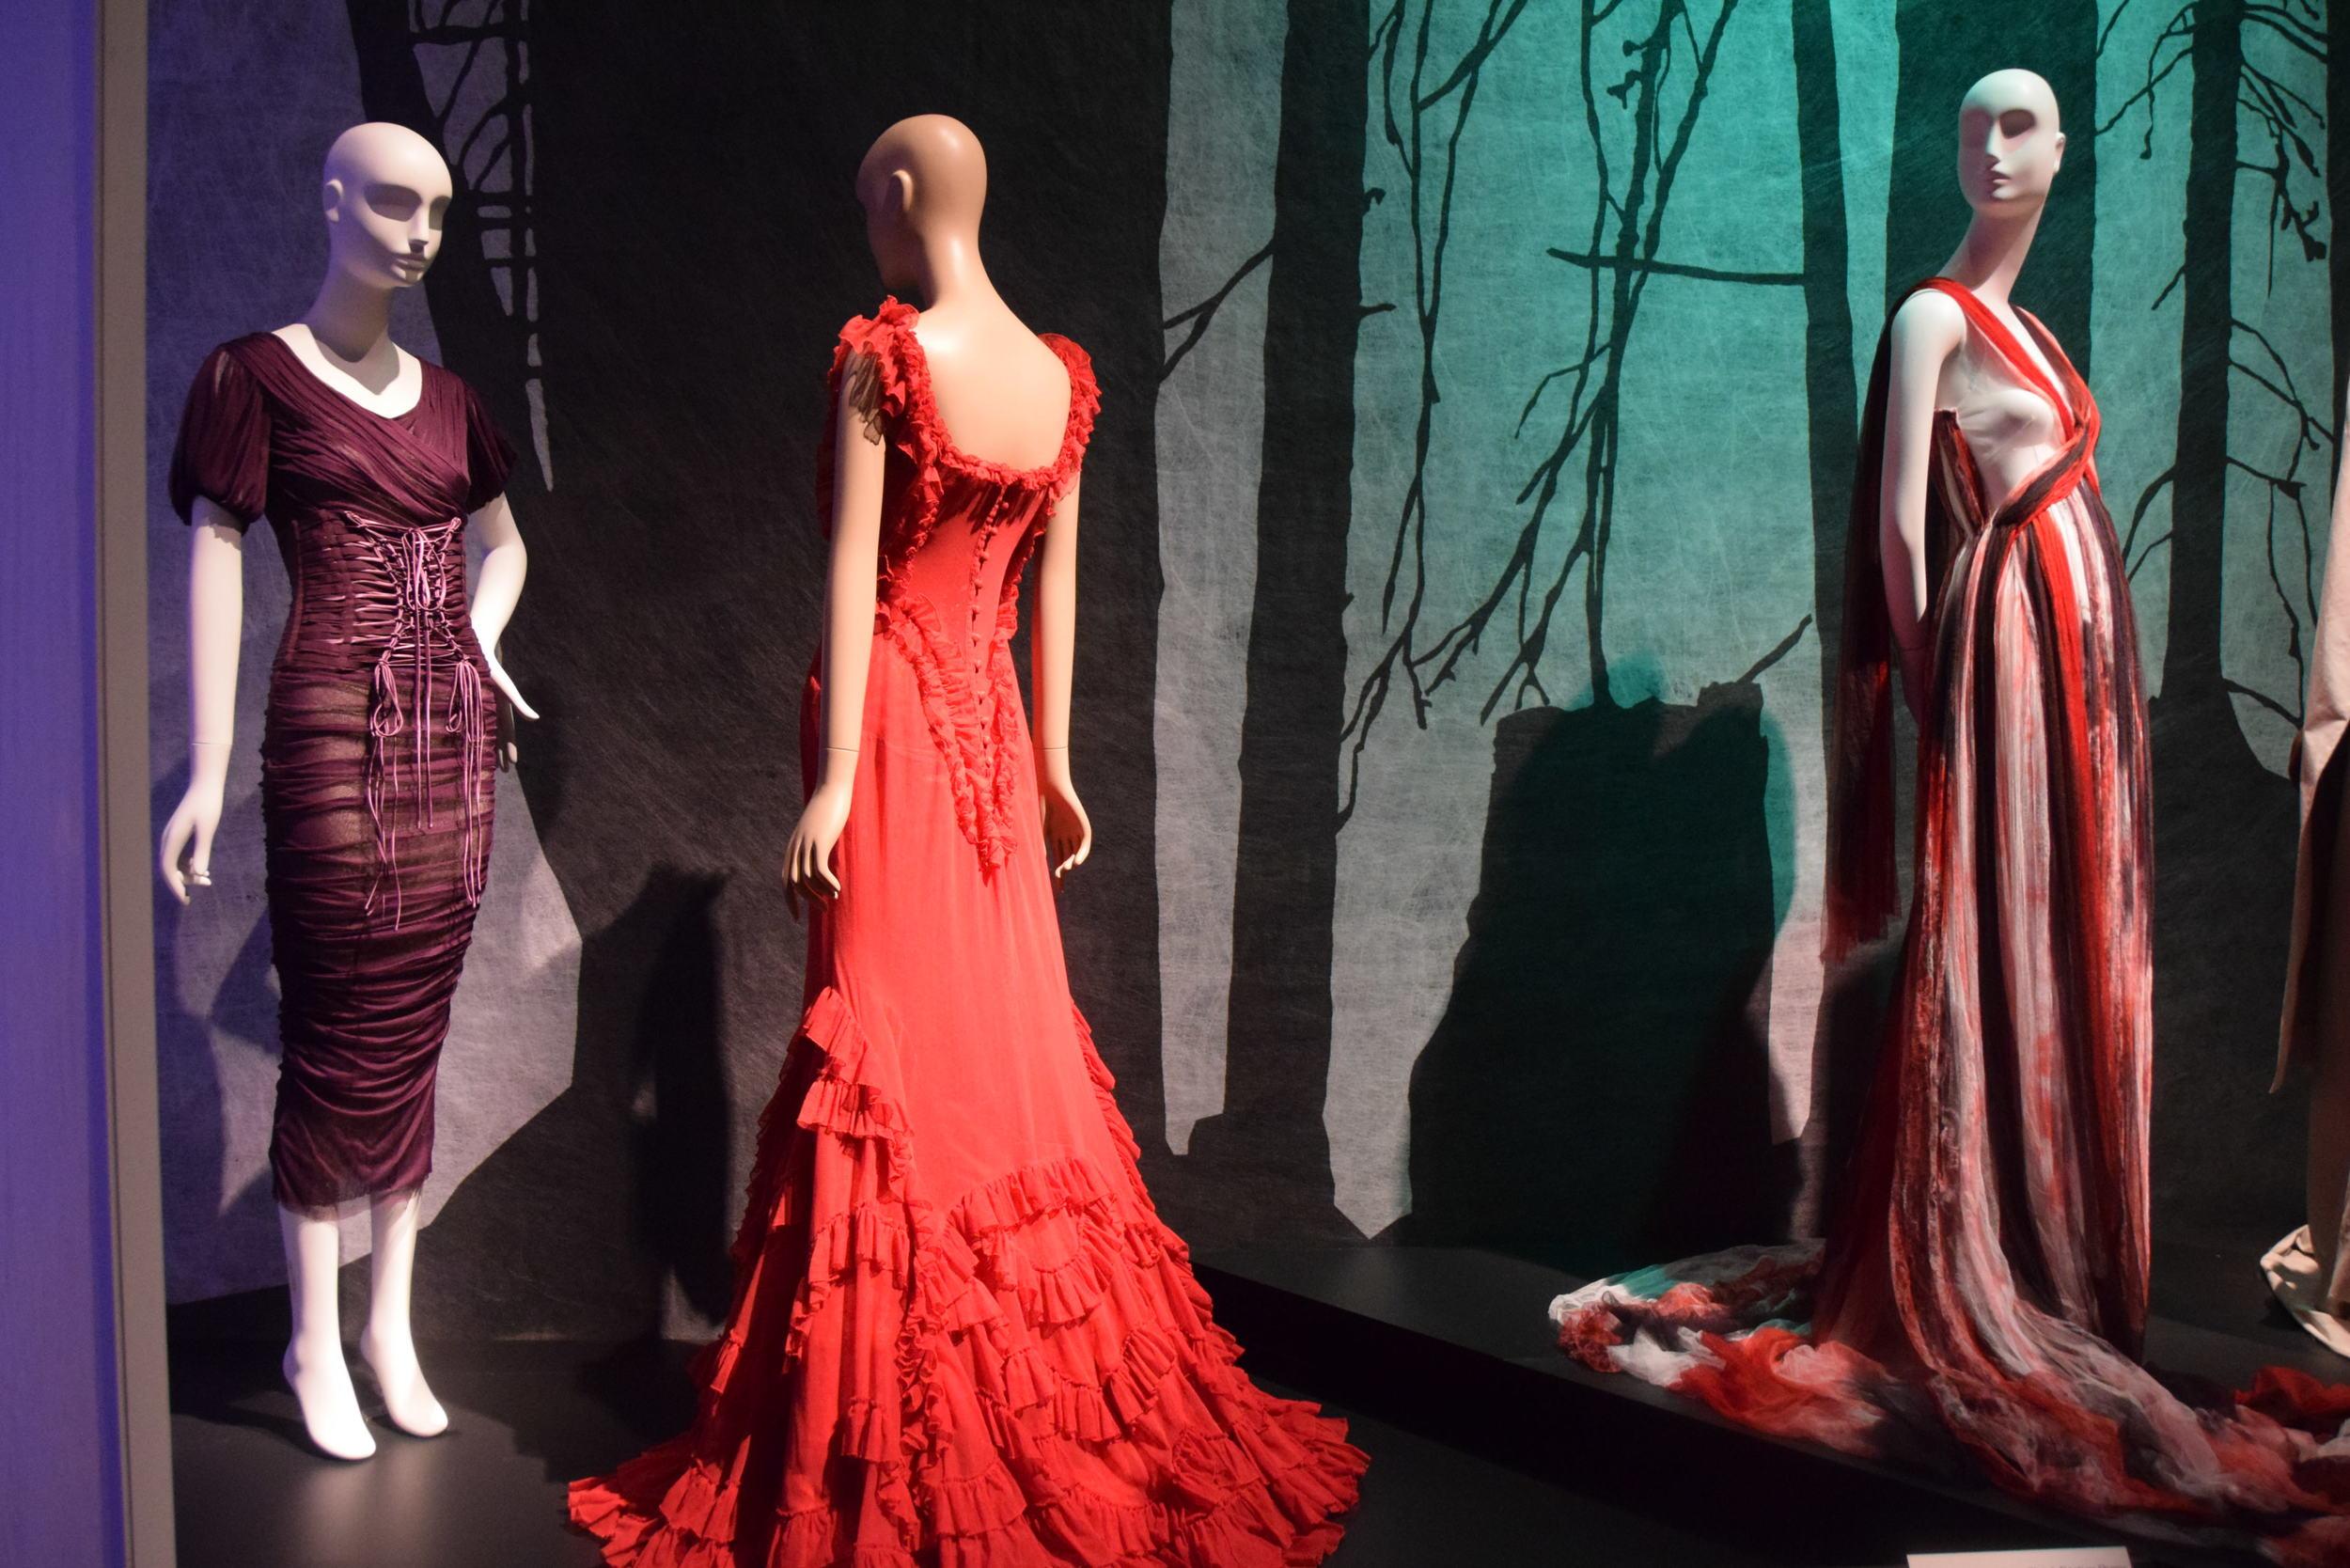 Purple dress, Dolce & Gabbana (2014); Red dress, Soronen (2007), Striped dress, Rodarte (2008)